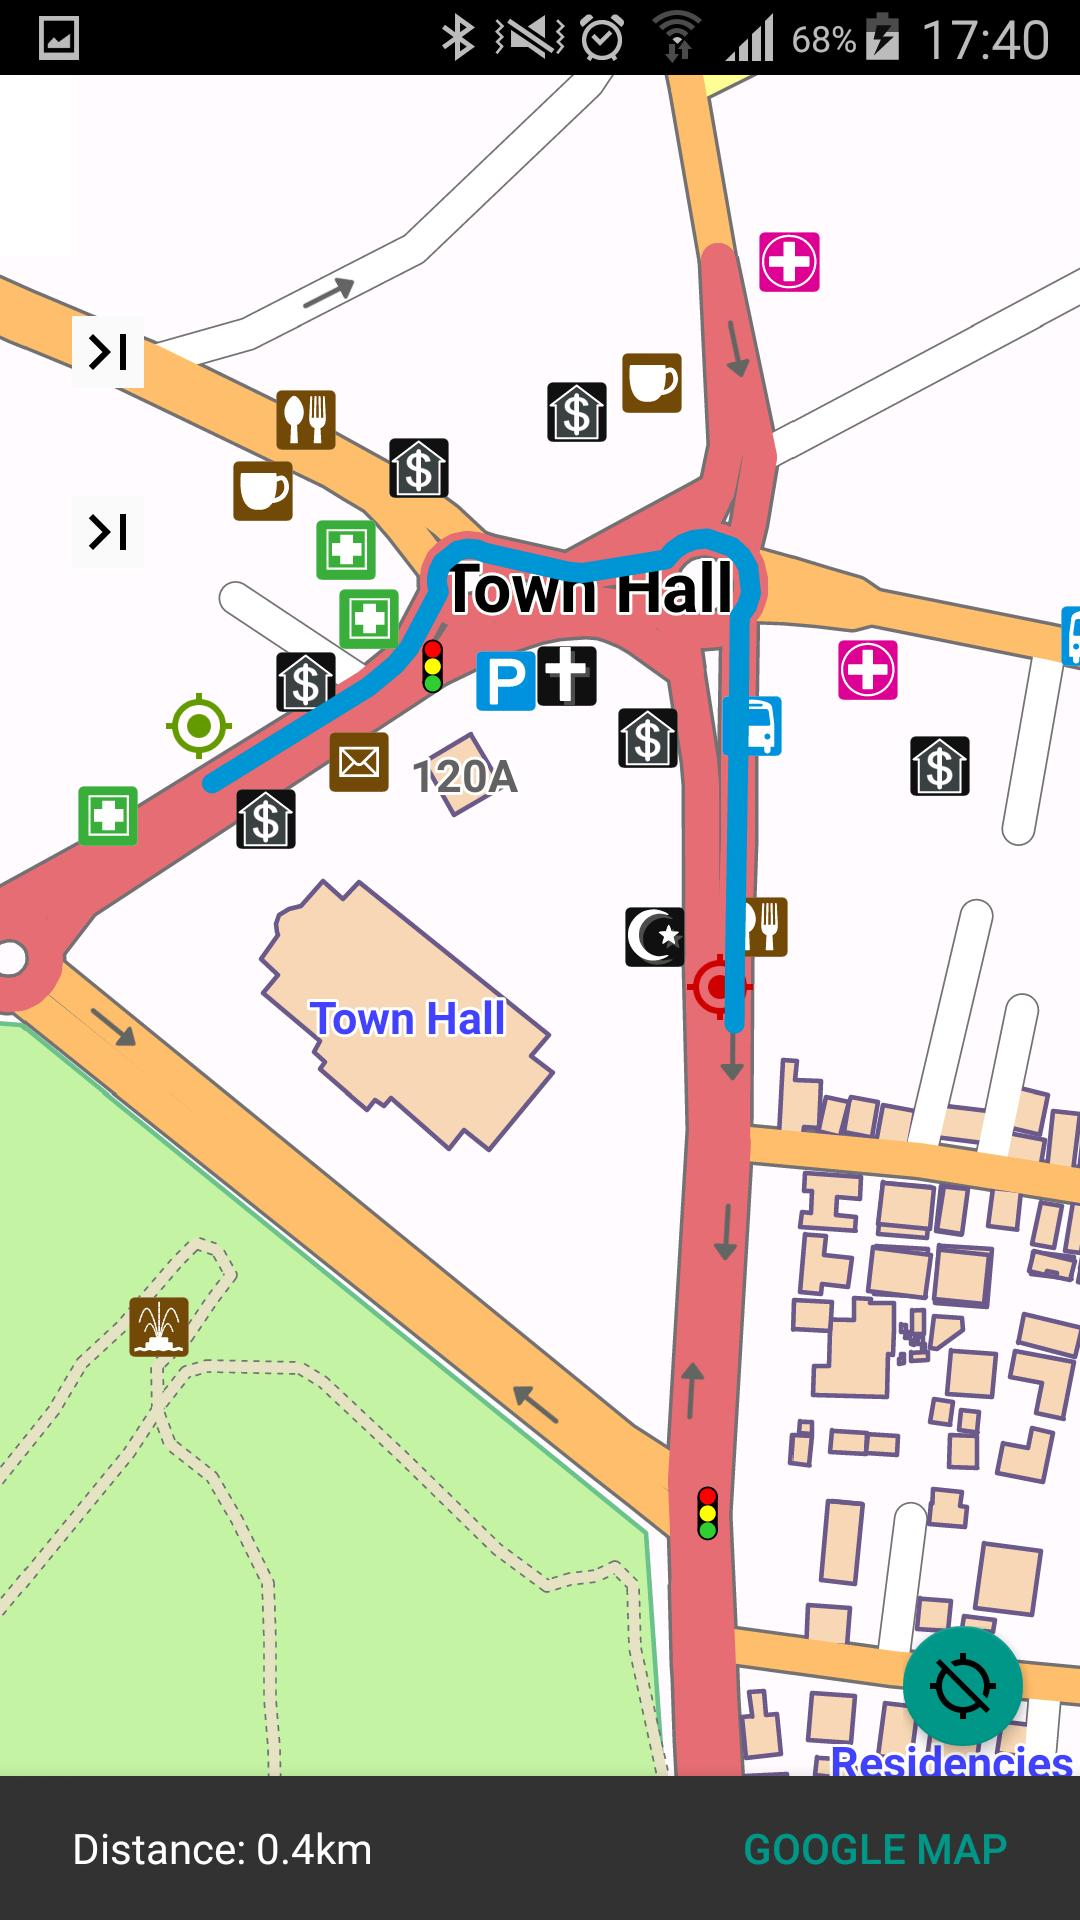 ANTANANARIVO MADAGASCAR MAP for Android - APK Download on sherbro island map, mbabane map, monrovia map, niamey map, cairo map, asmara map, kampala map, malabo map, masoala national park map, lilongwe map, pretoria map, casablanca map, harare map, kinshasa map, bujumbura map, maseru map, lagos map, dar es salaam map, johannesburg map, al hasakah map,